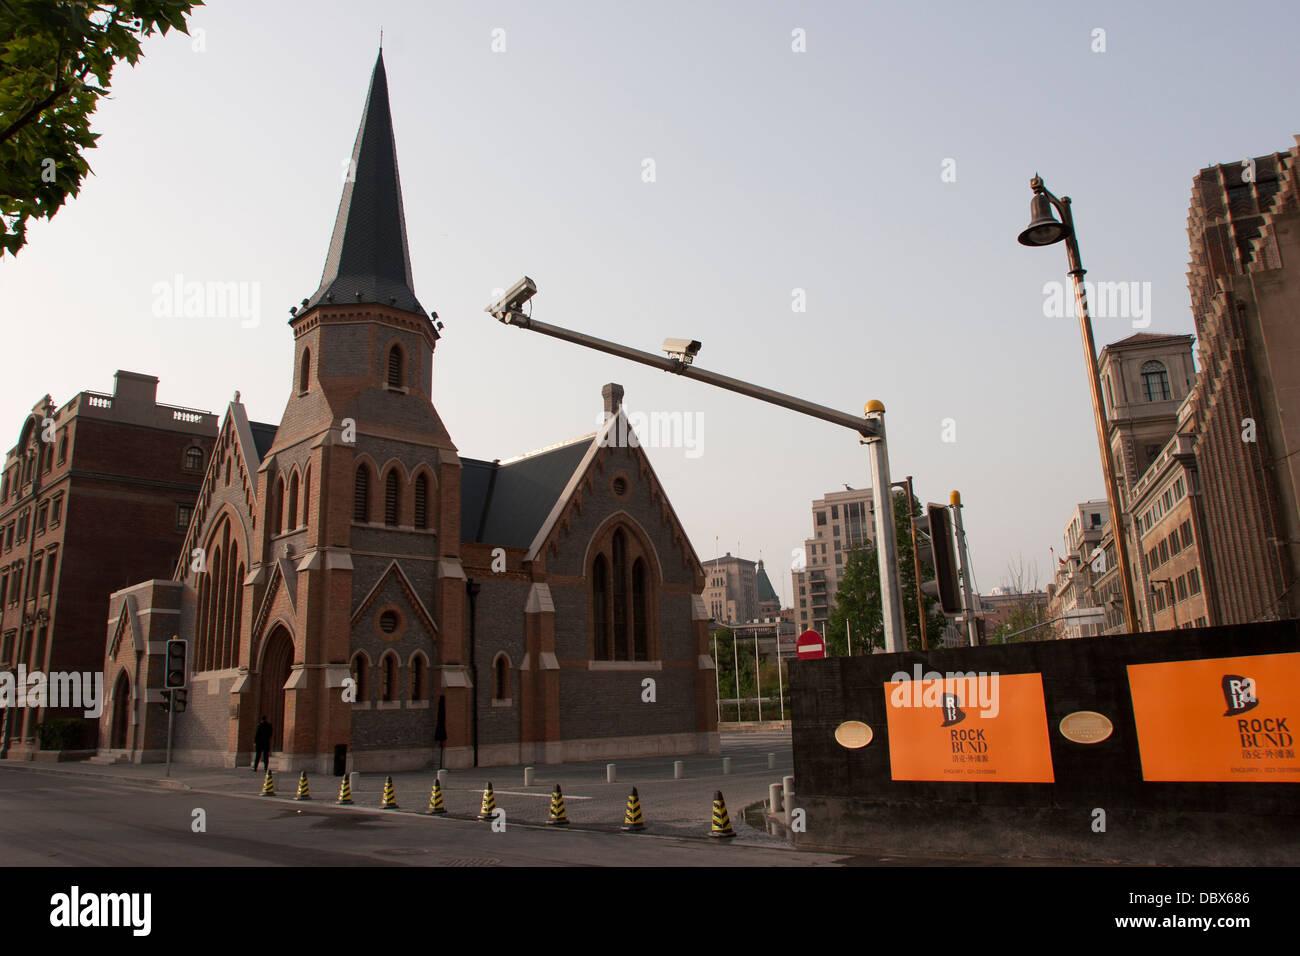 Rock Camera Surveillance : Surveillance or traffic cameras outside the union church nan suzhou